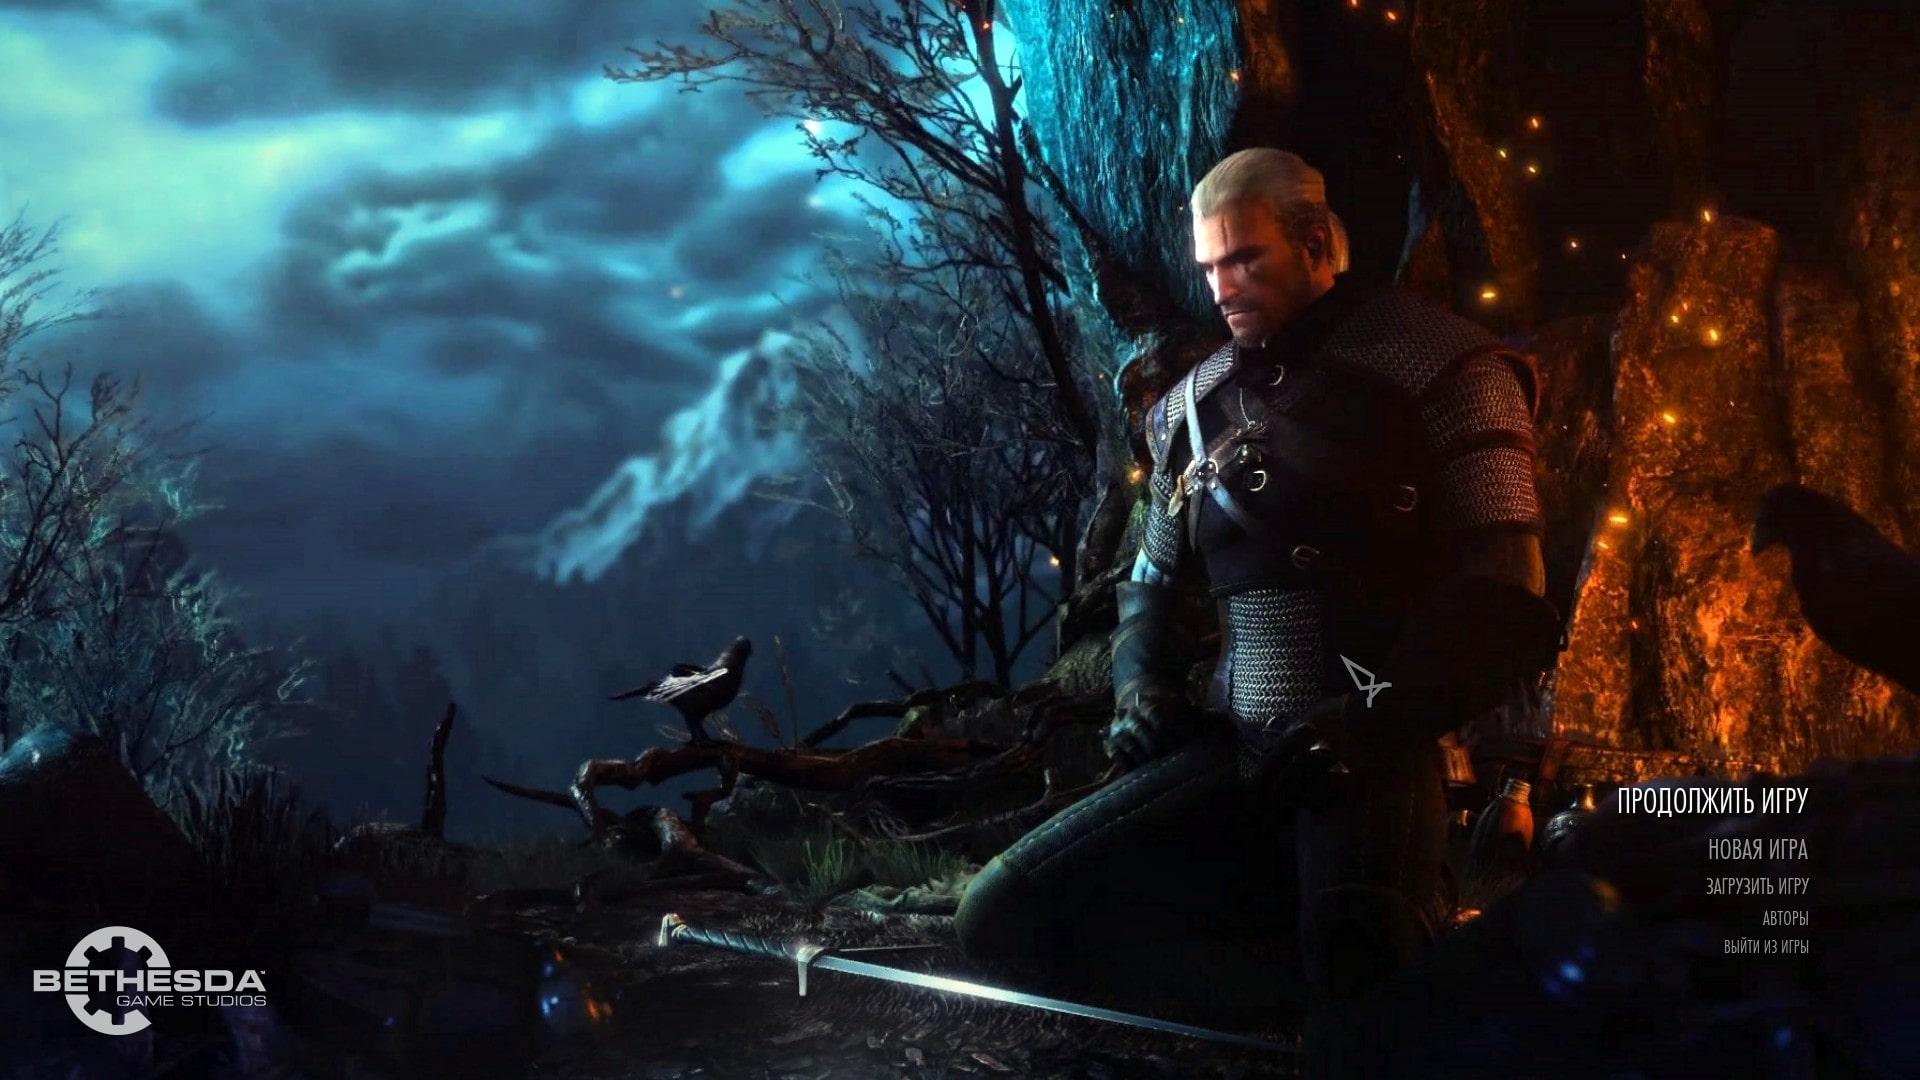 Witcher 3 Main Menu and Music Replacer for Skyrim | Меню из Ведьмак 3 для Скайрима